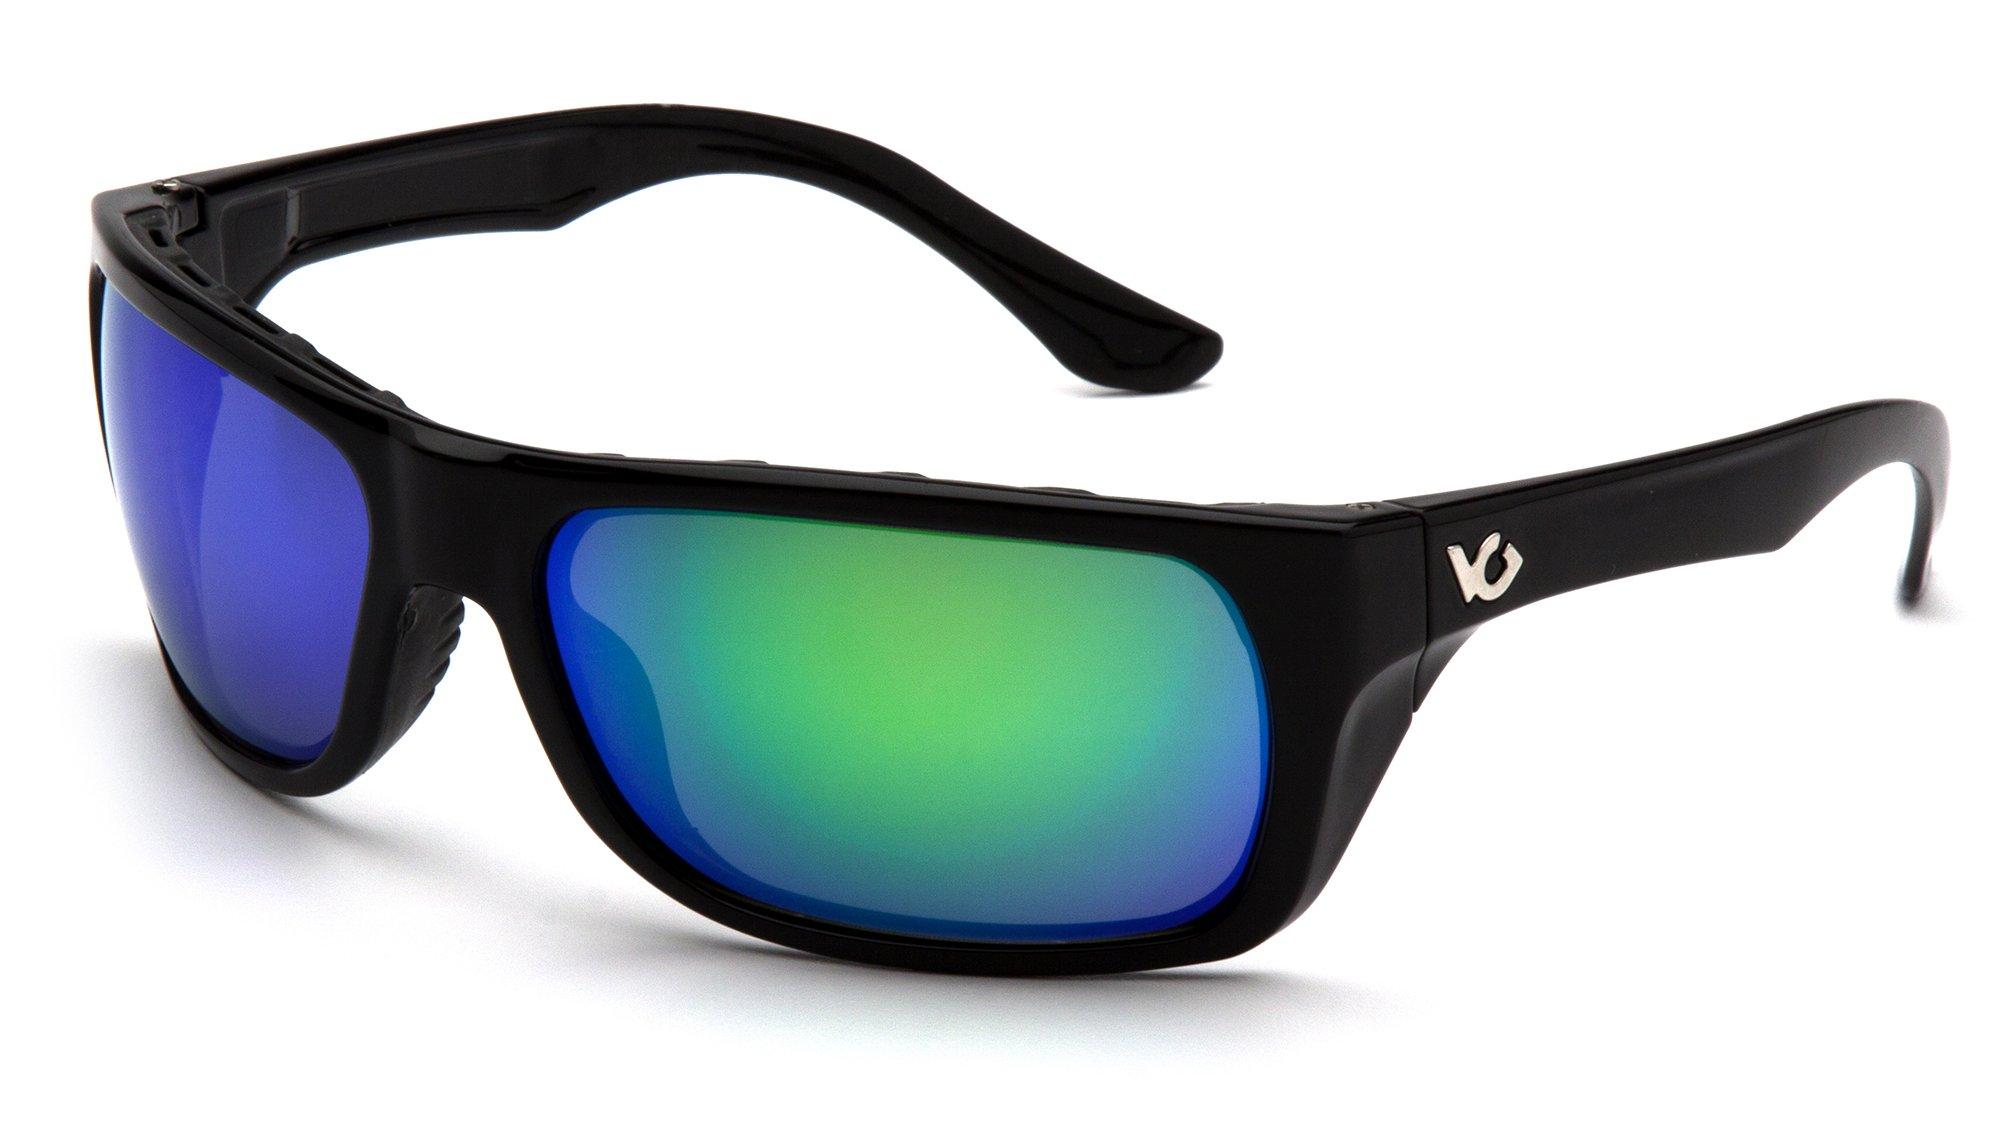 Venture Gear Vallejo Glasses, Black Frame by Venture Gear